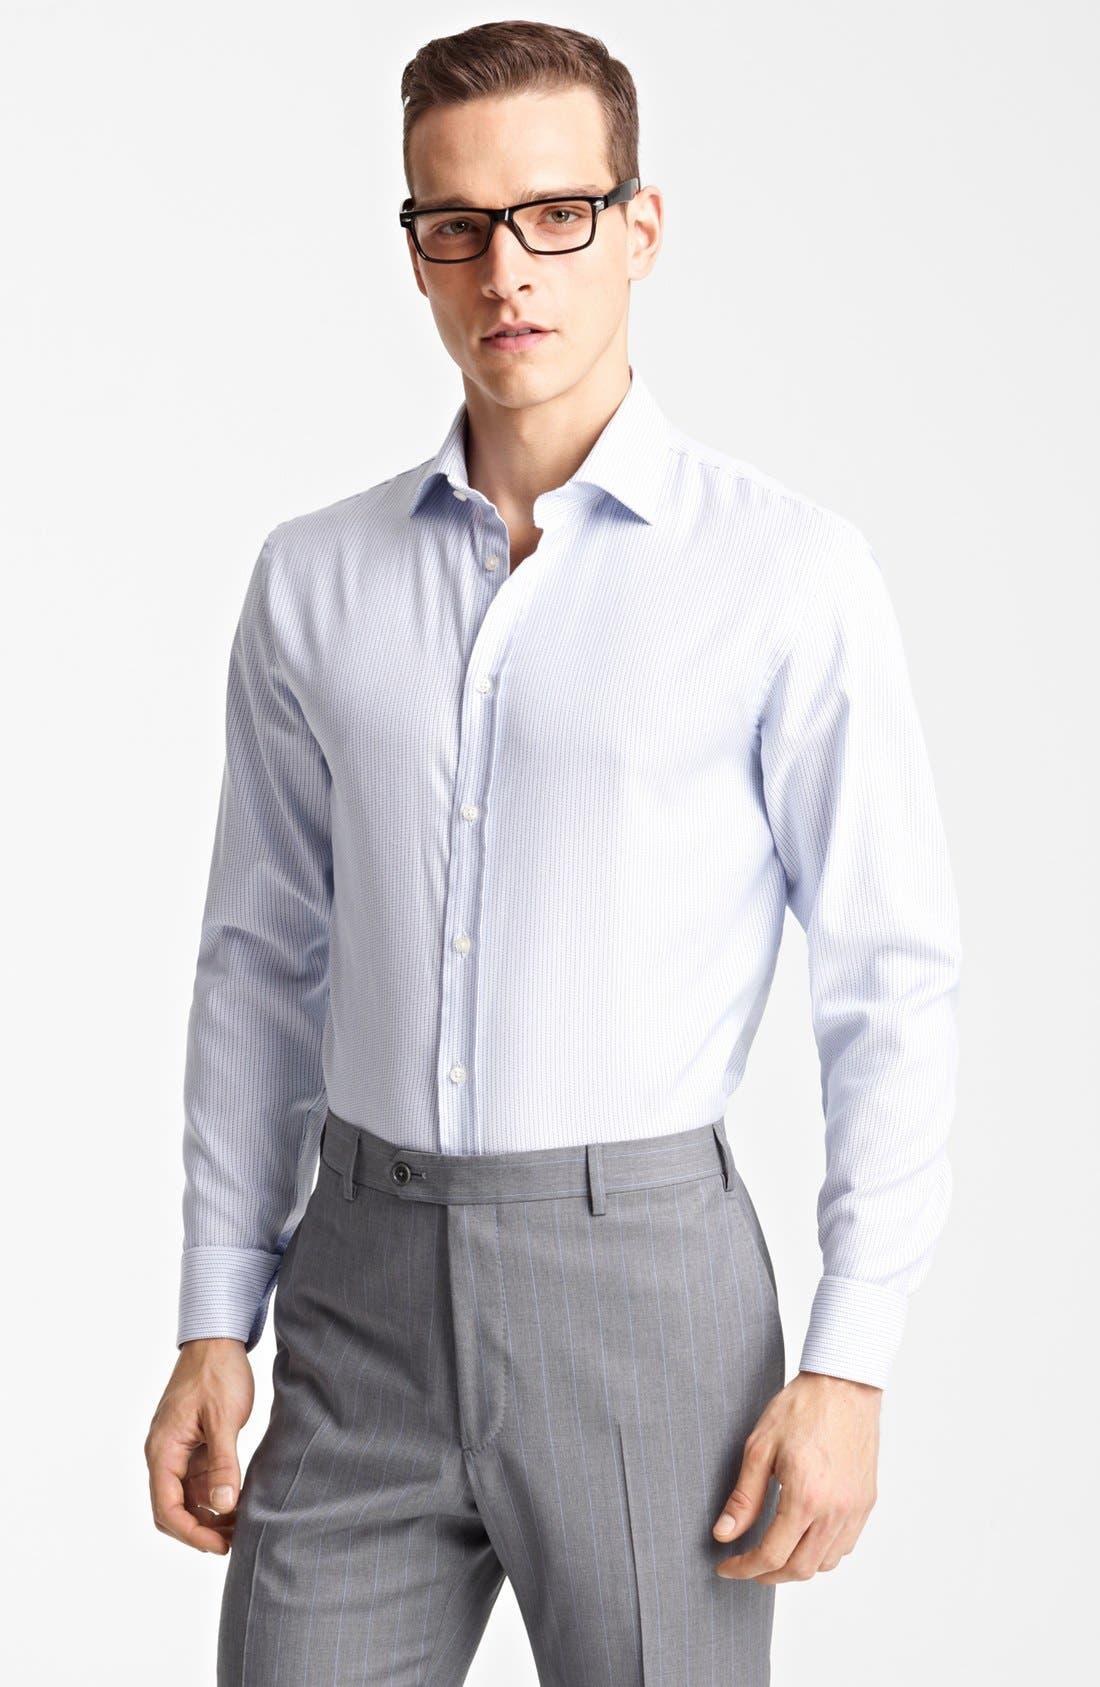 Alternate Image 1 Selected - Armani Collezioni Microstripe Dress Shirt